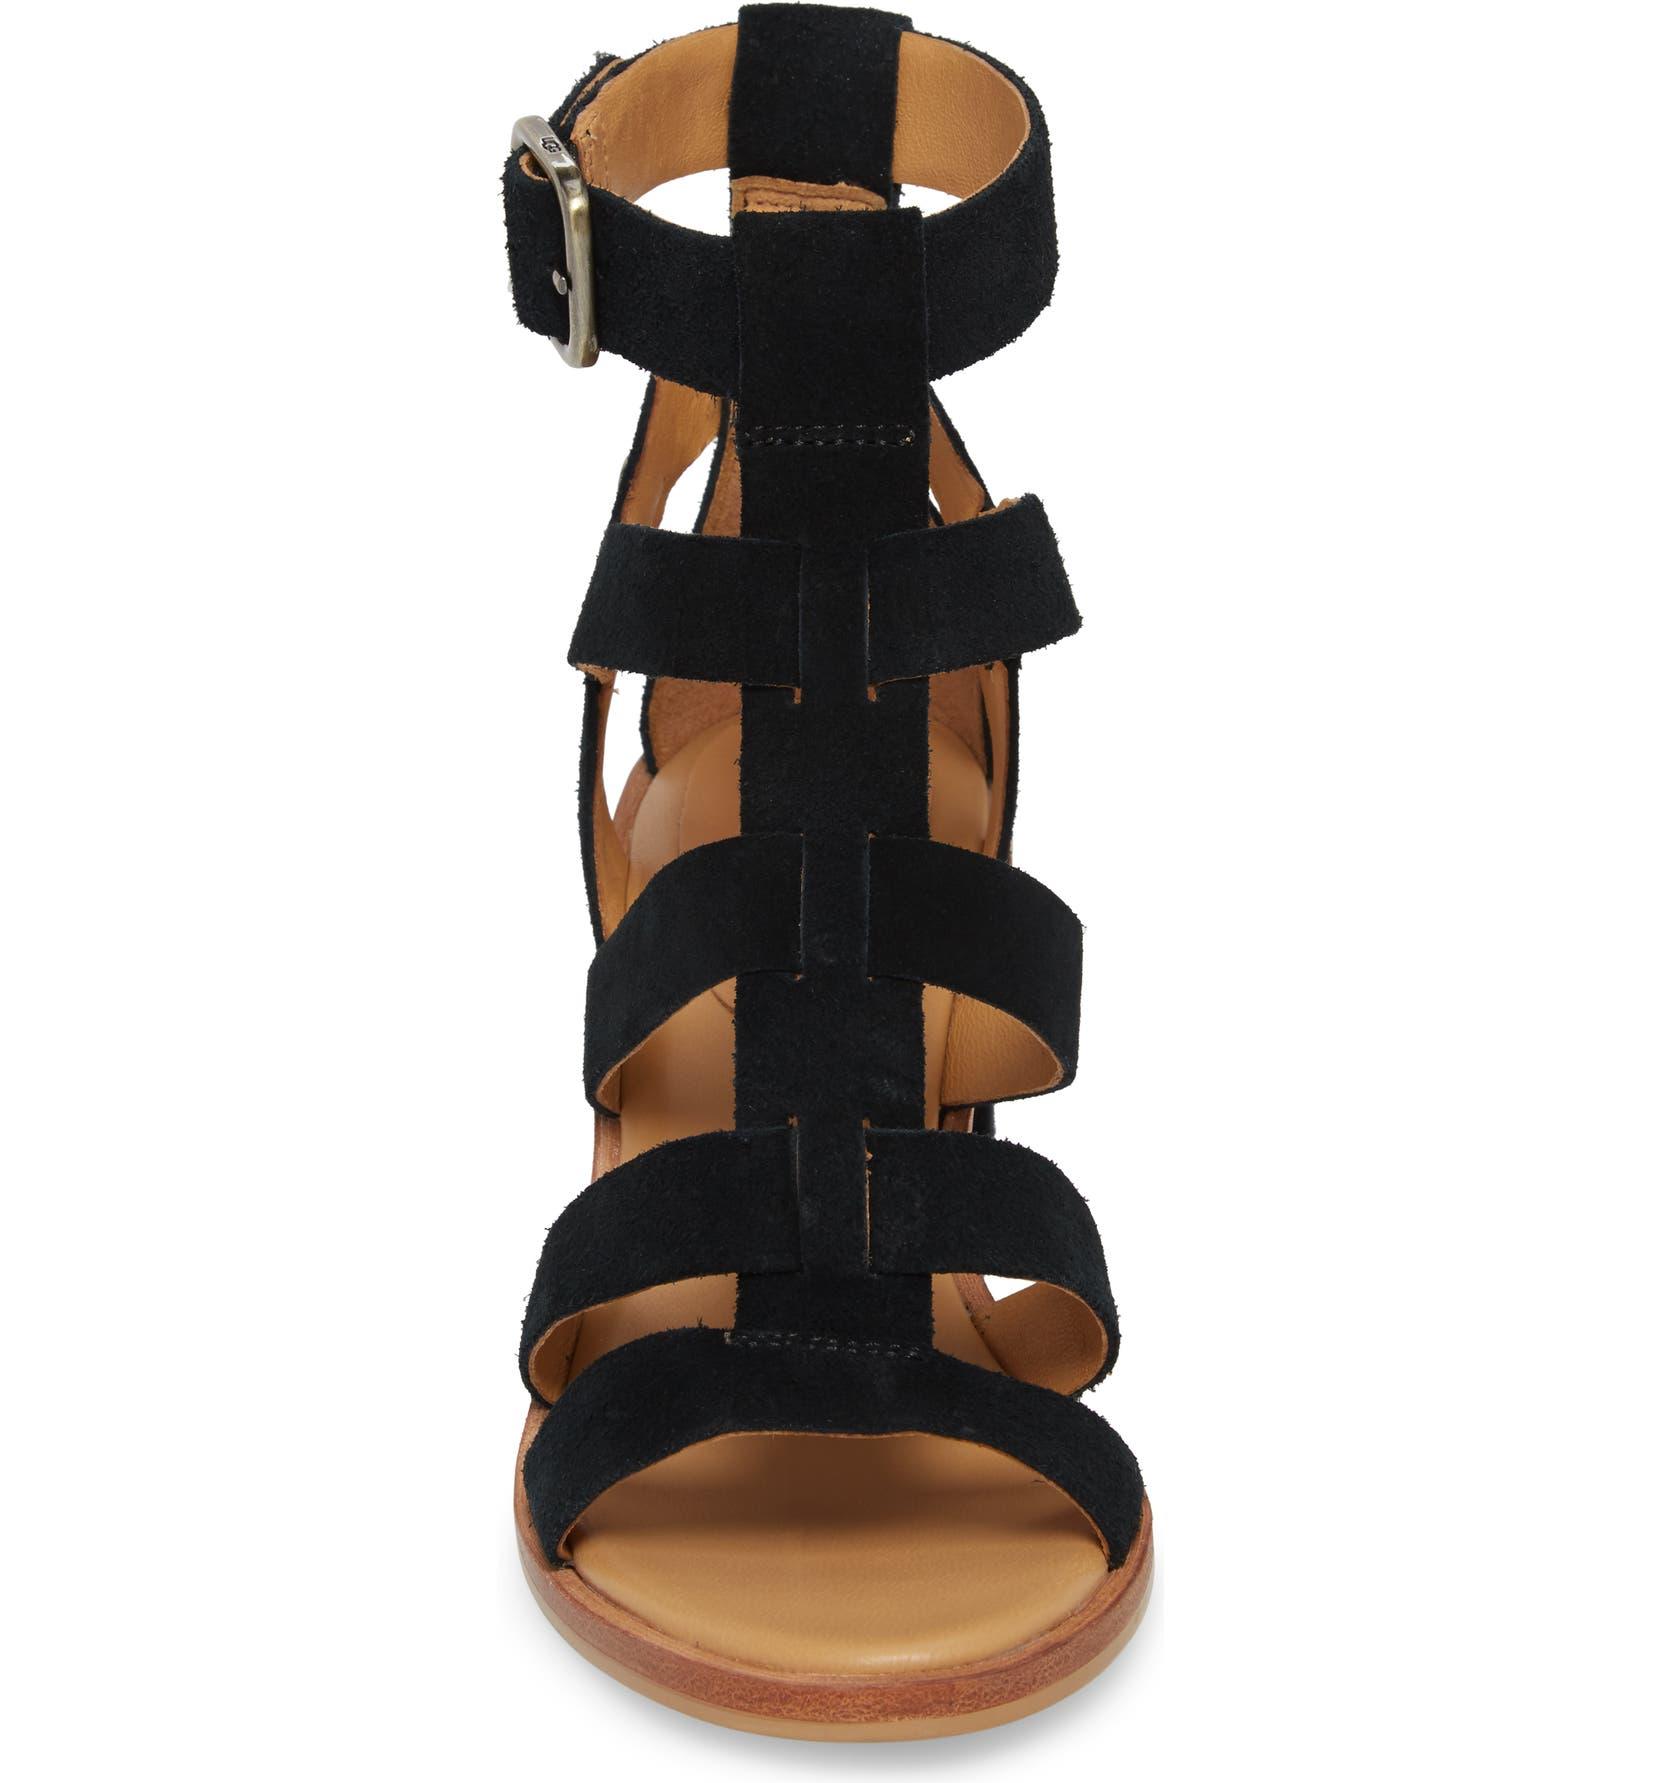 03208dd1c65 Macayla Block Heel Sandal